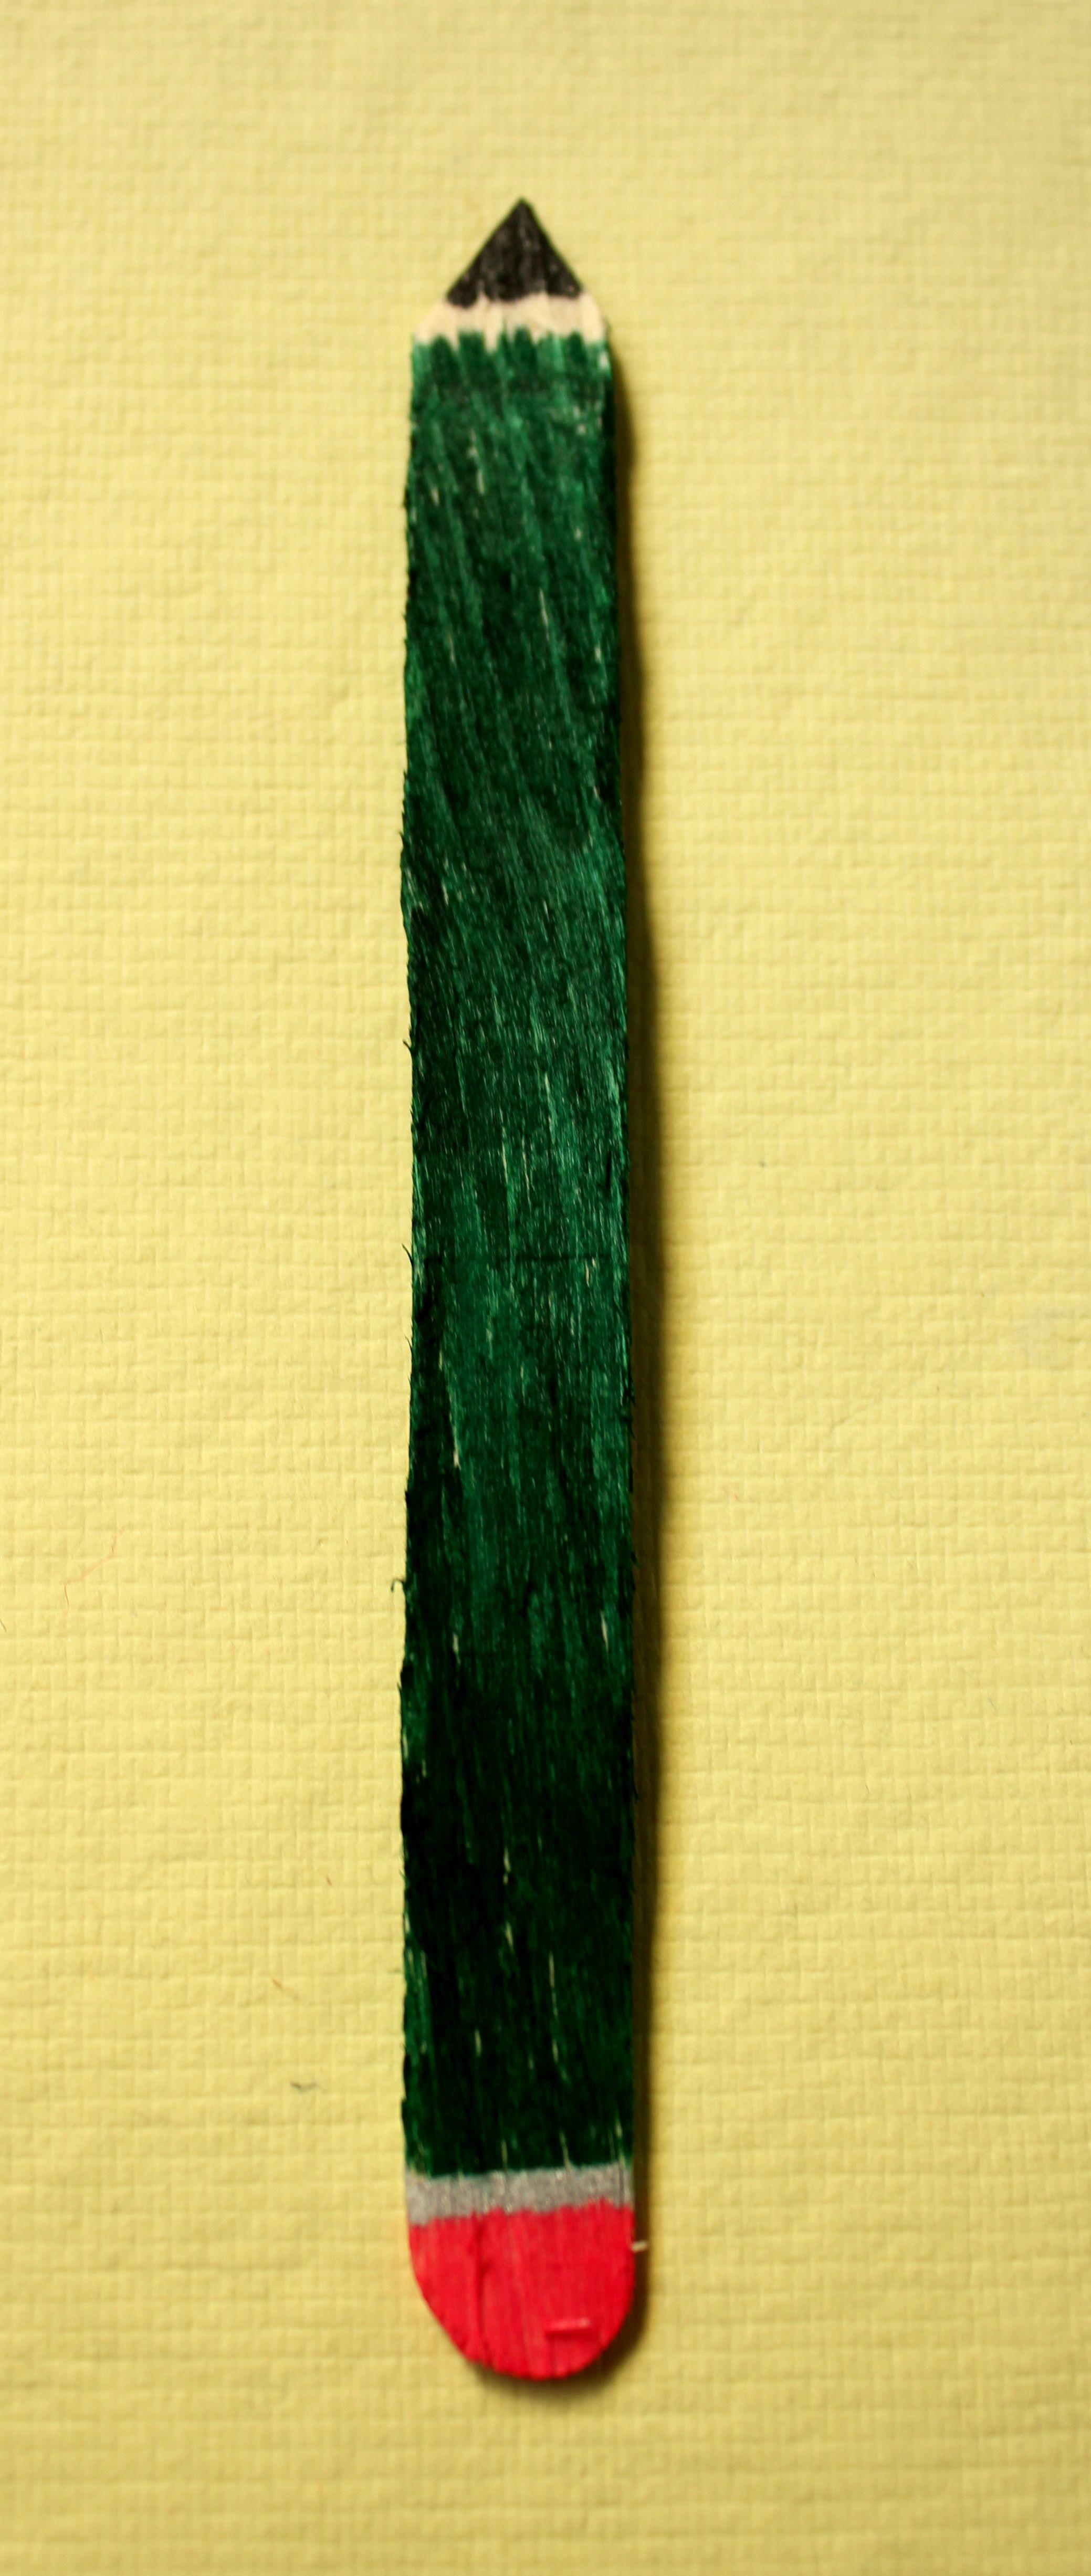 Bookmarks Icecream Sticks Things I Have Made Diy Crochet